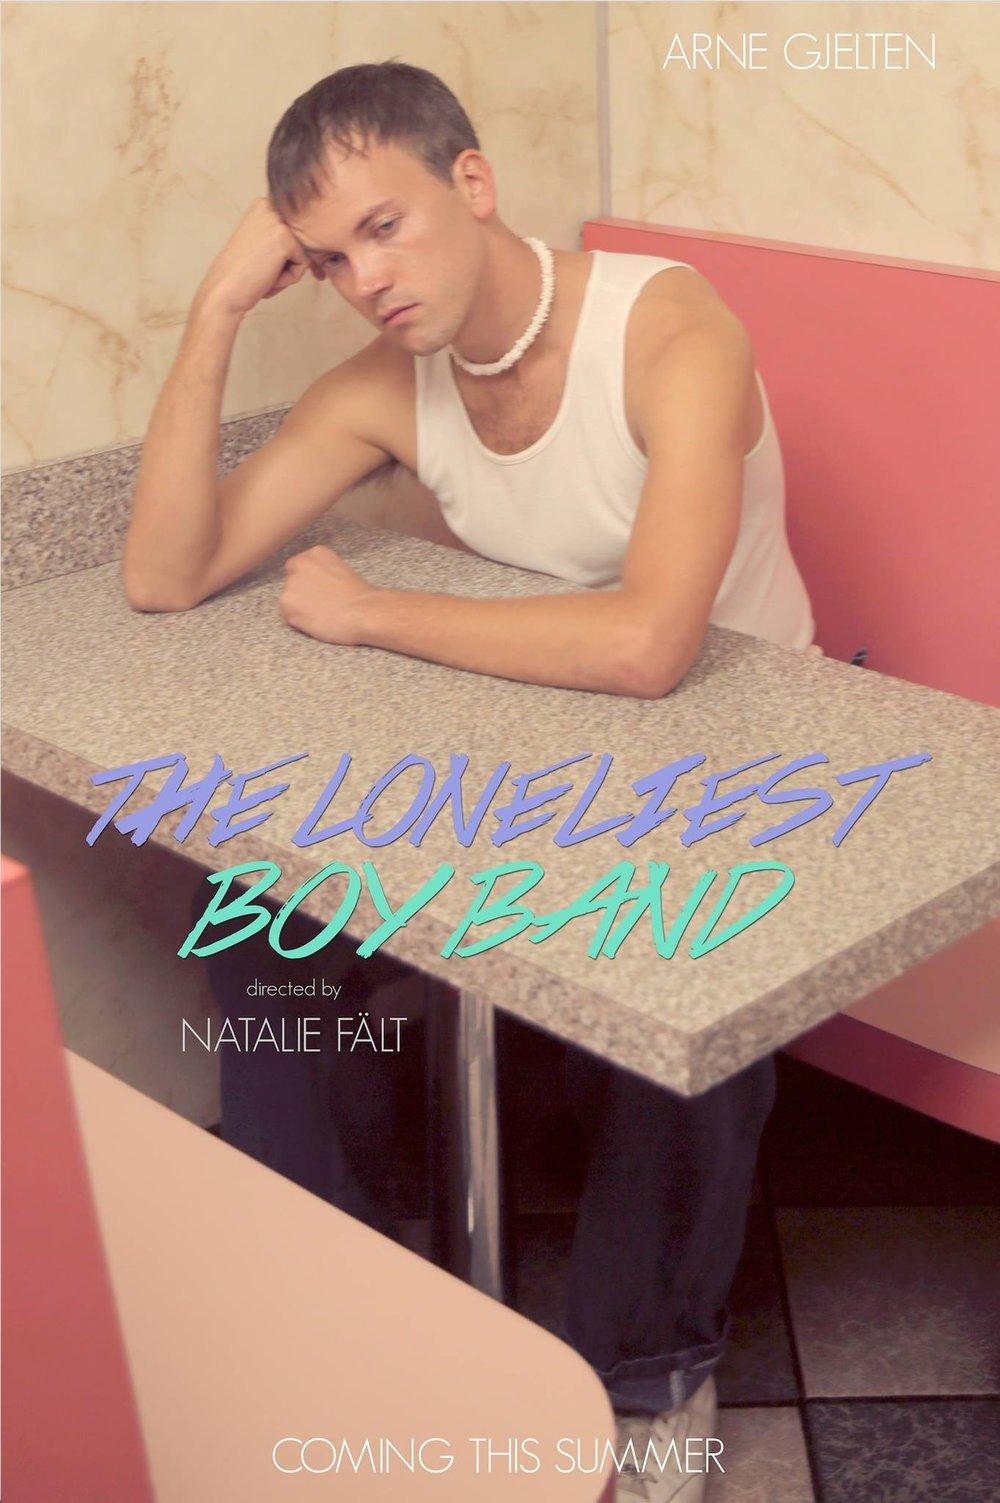 Loneliest Boy Band.jpg